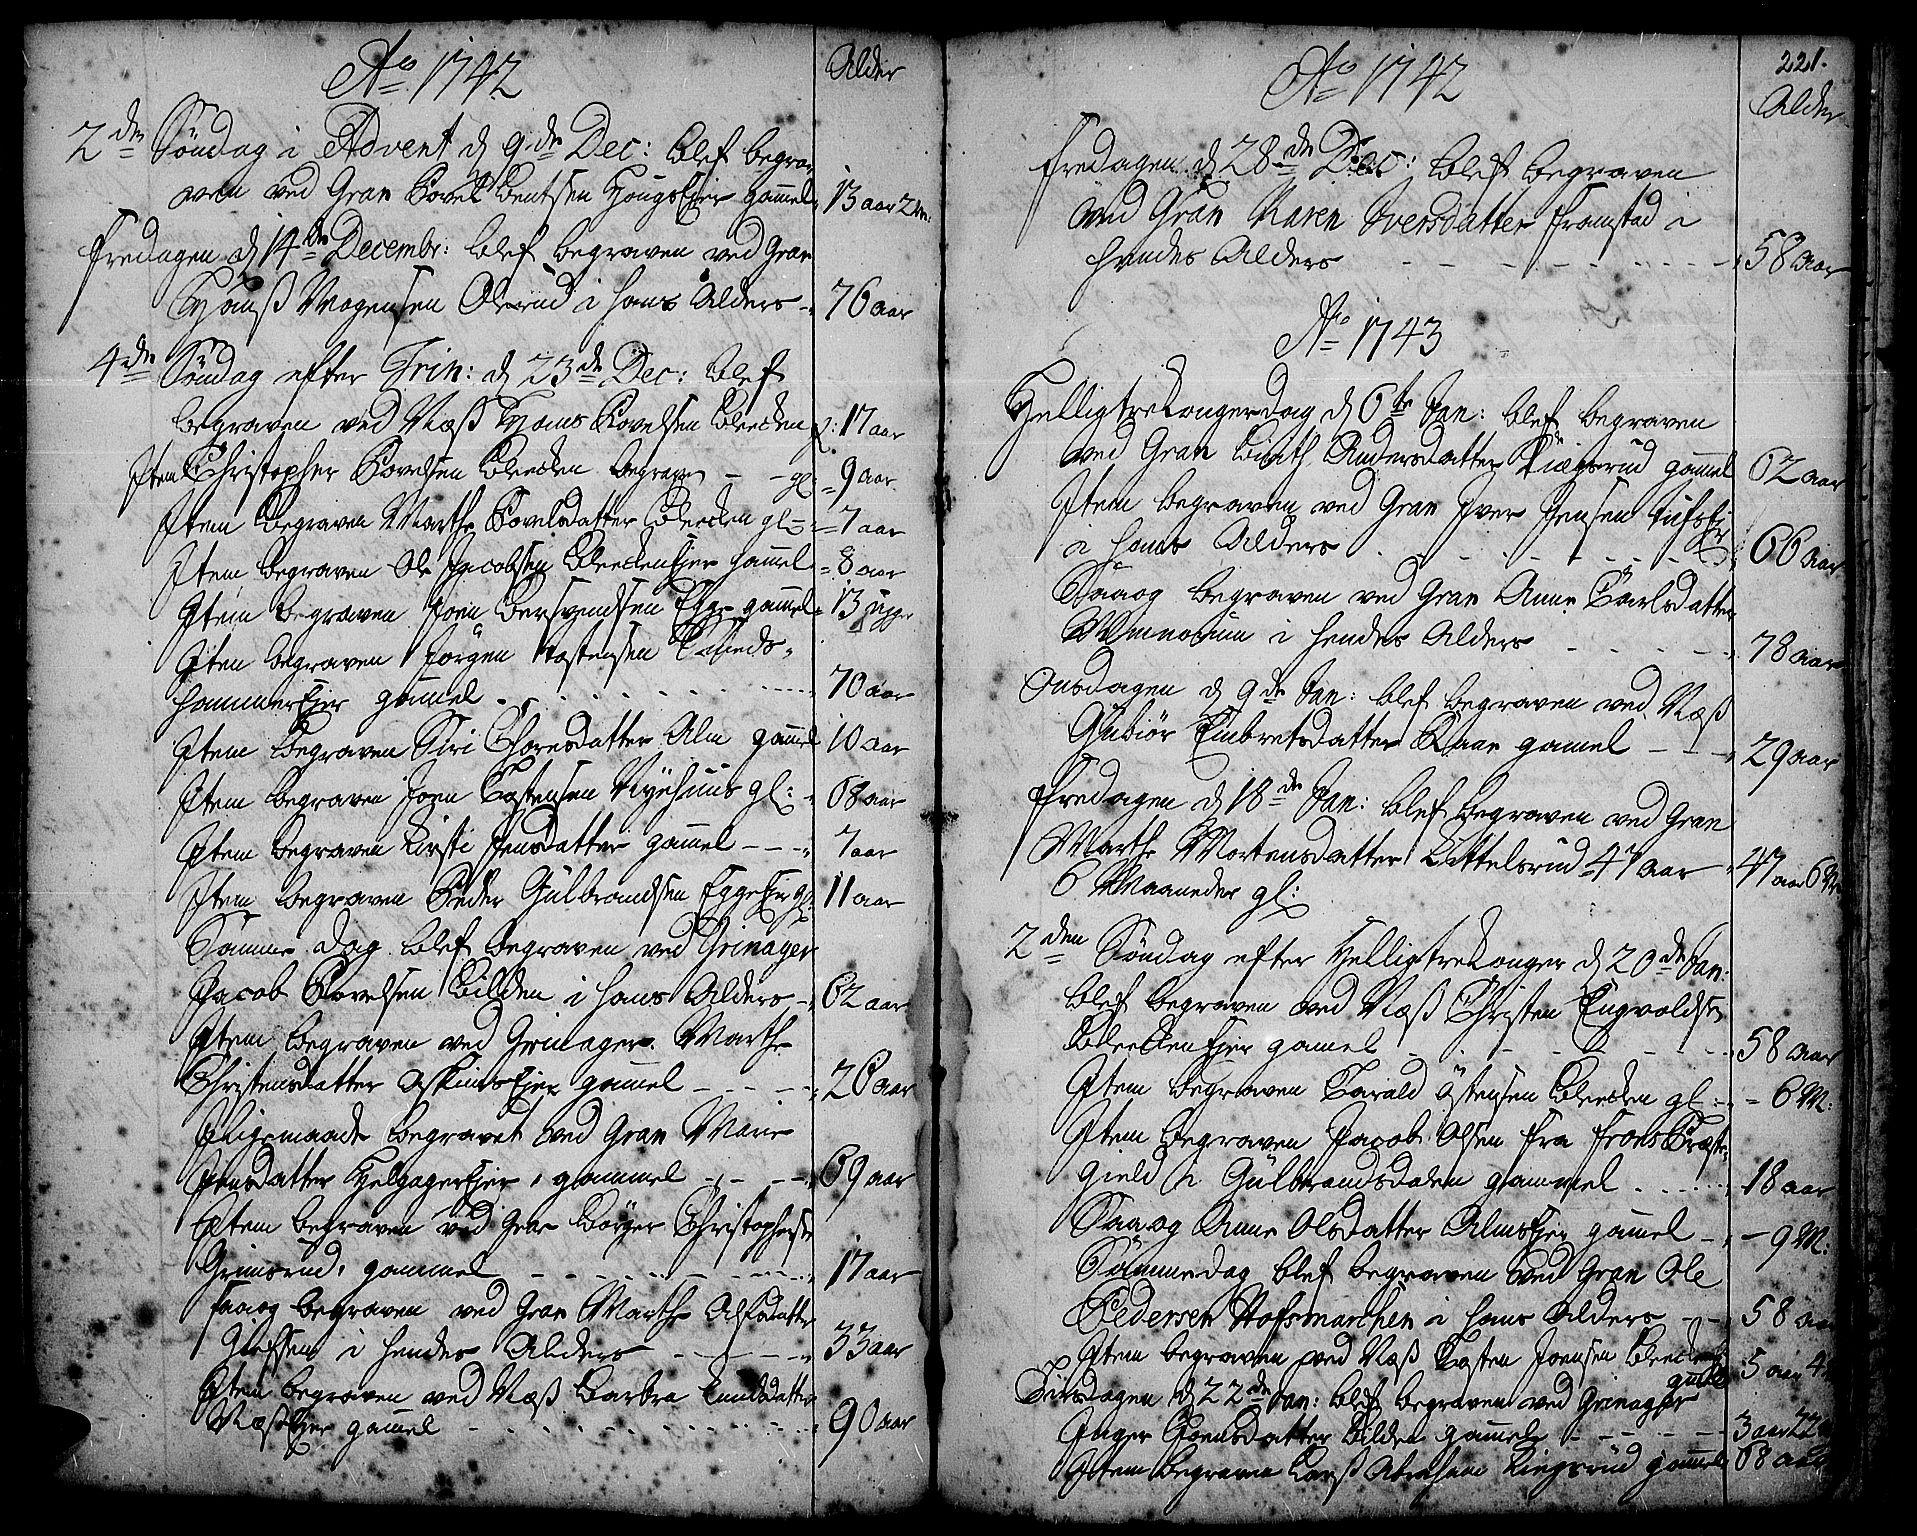 SAH, Gran prestekontor, Ministerialbok nr. 2, 1732-1744, s. 221